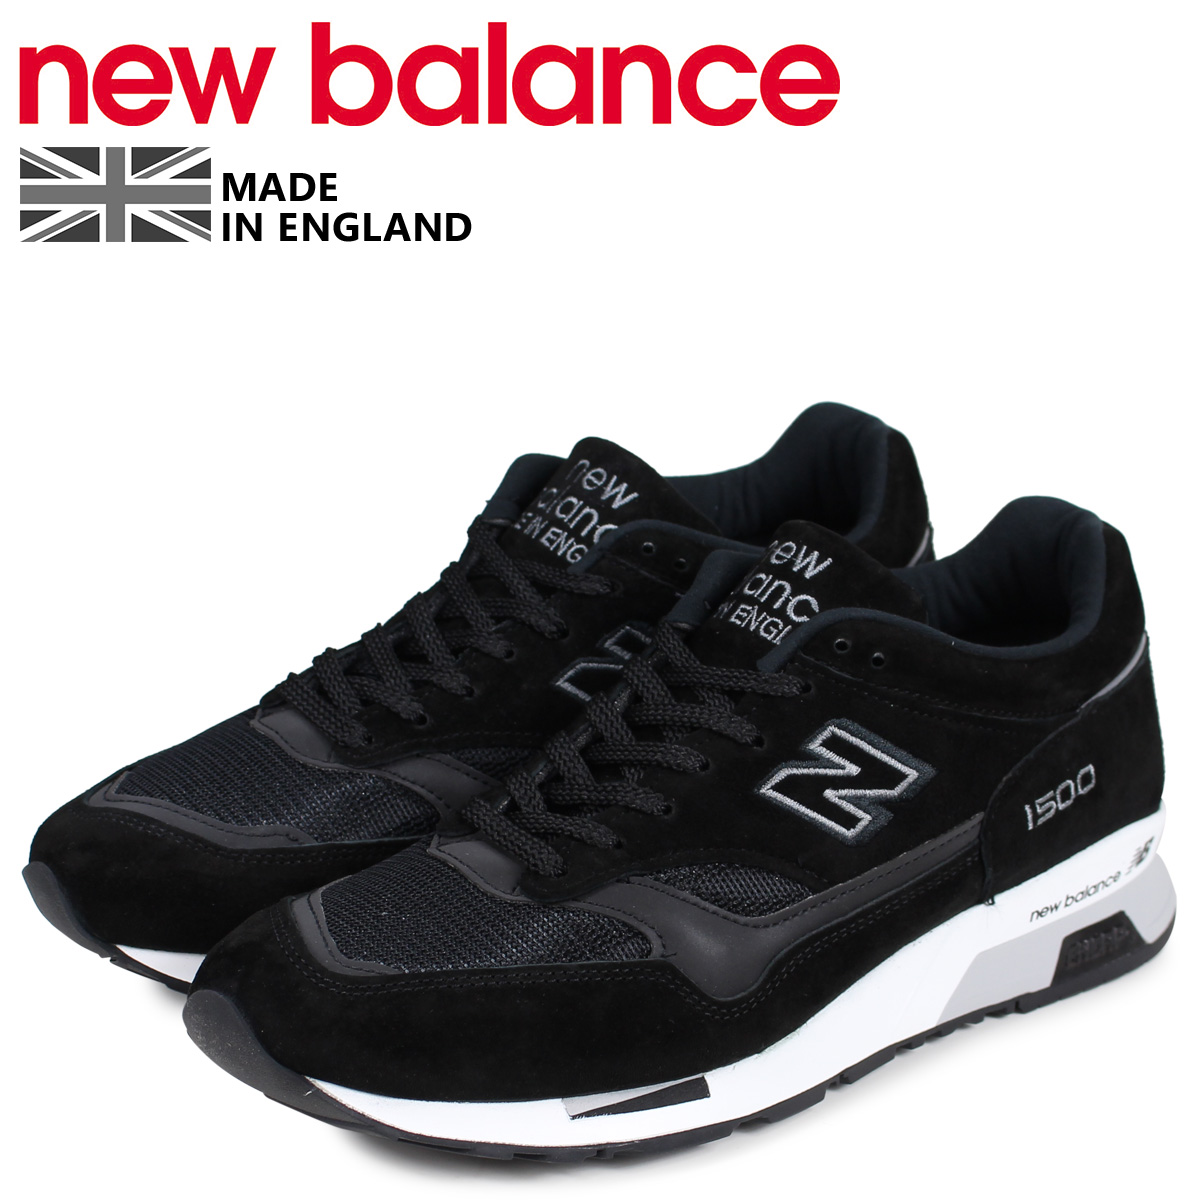 nb 1500 black